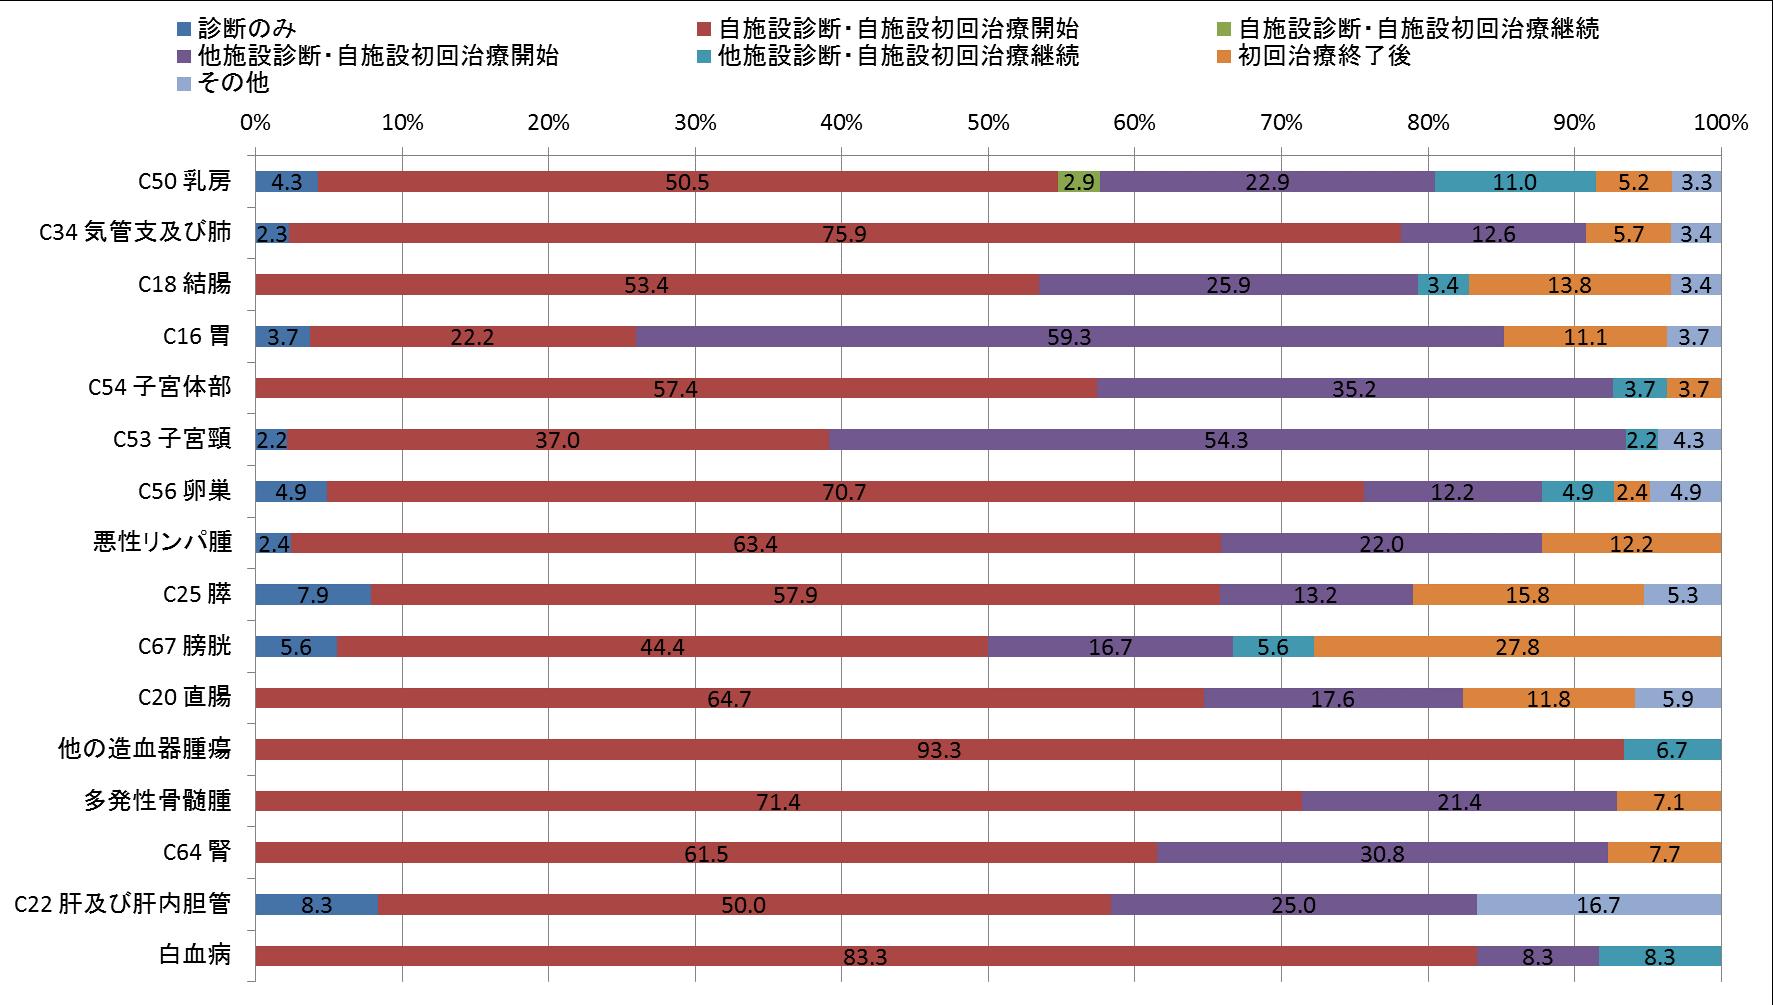 図6-3 症例区分別登録数(女、登録数2桁以上のみ)